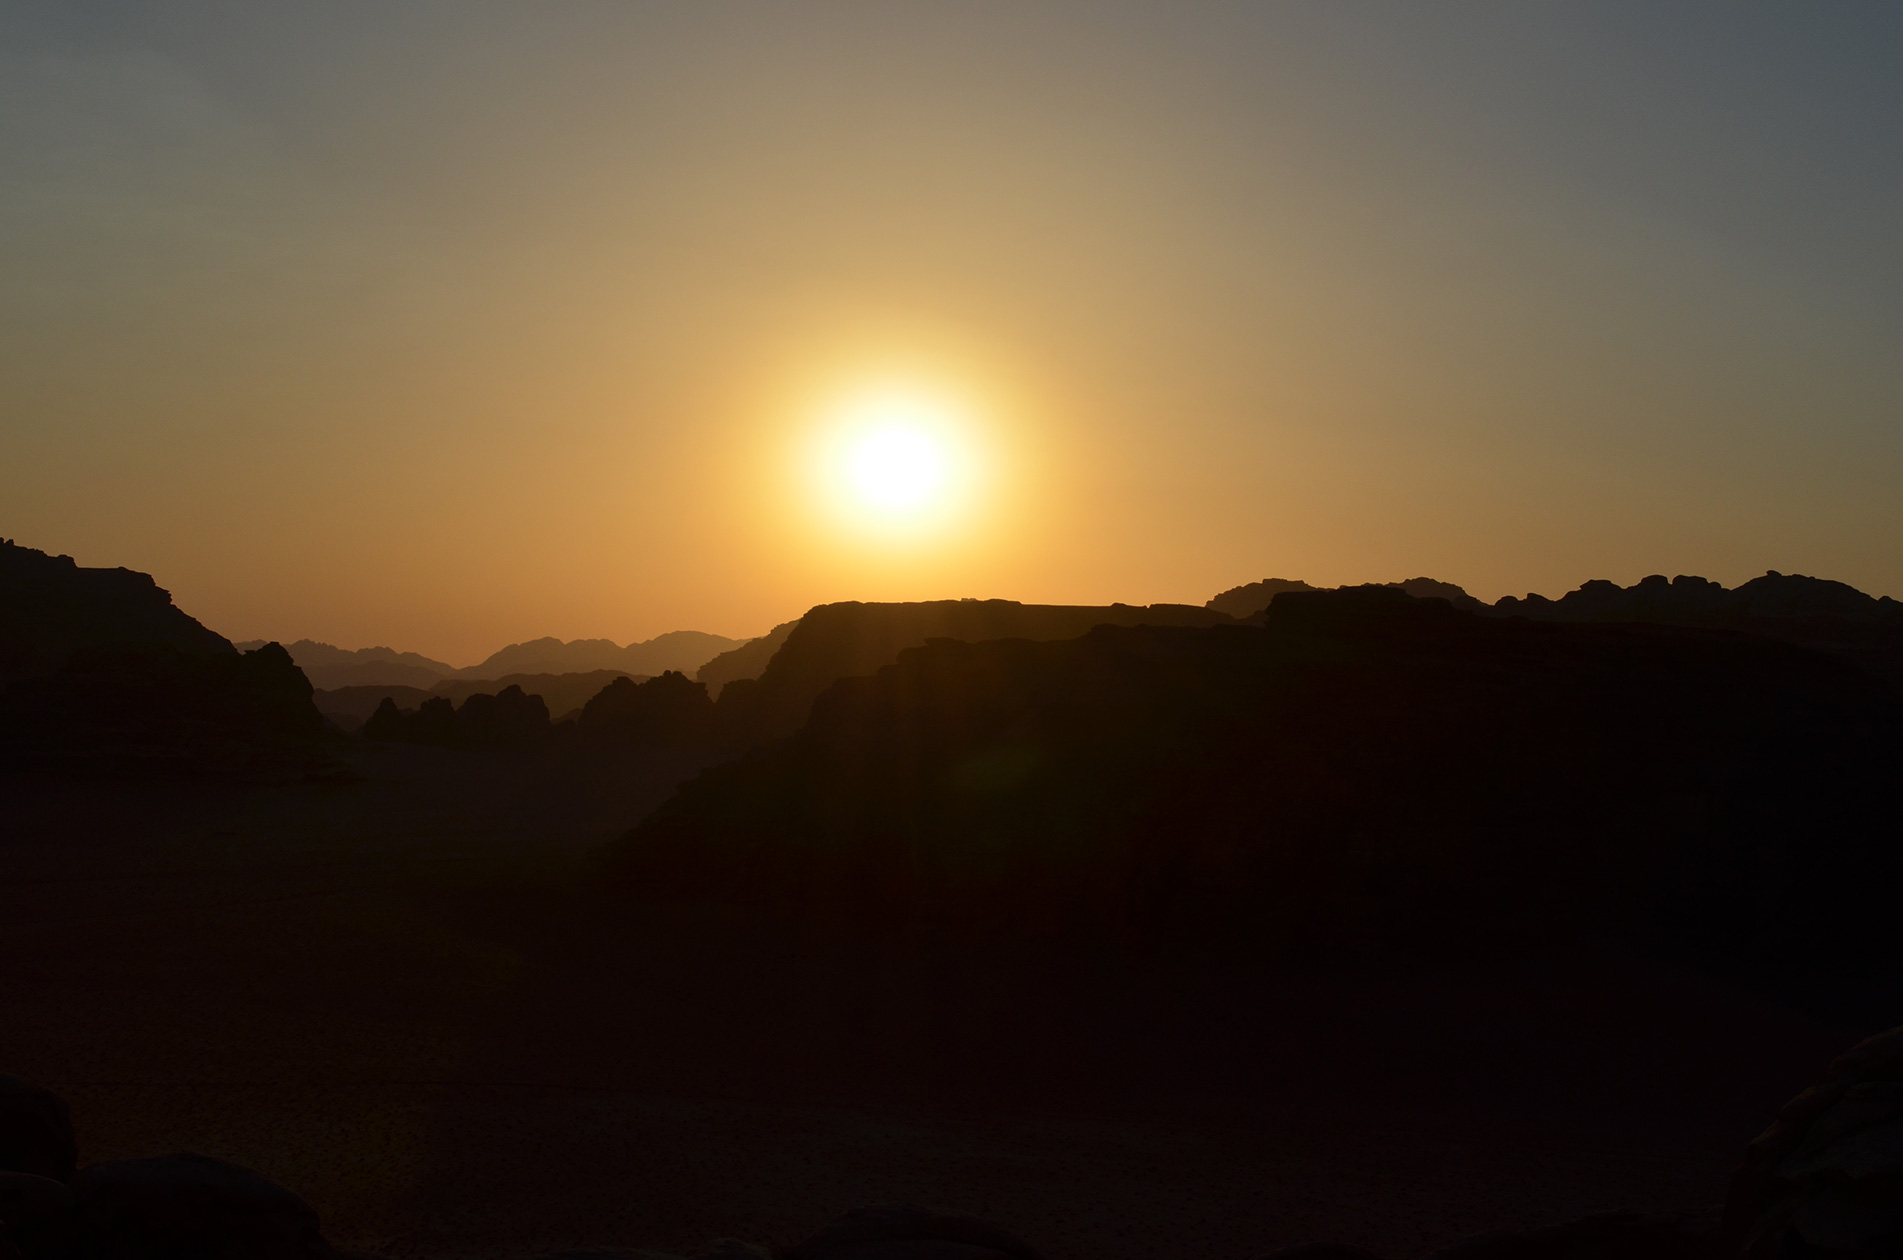 Sunset in Wadin Rum